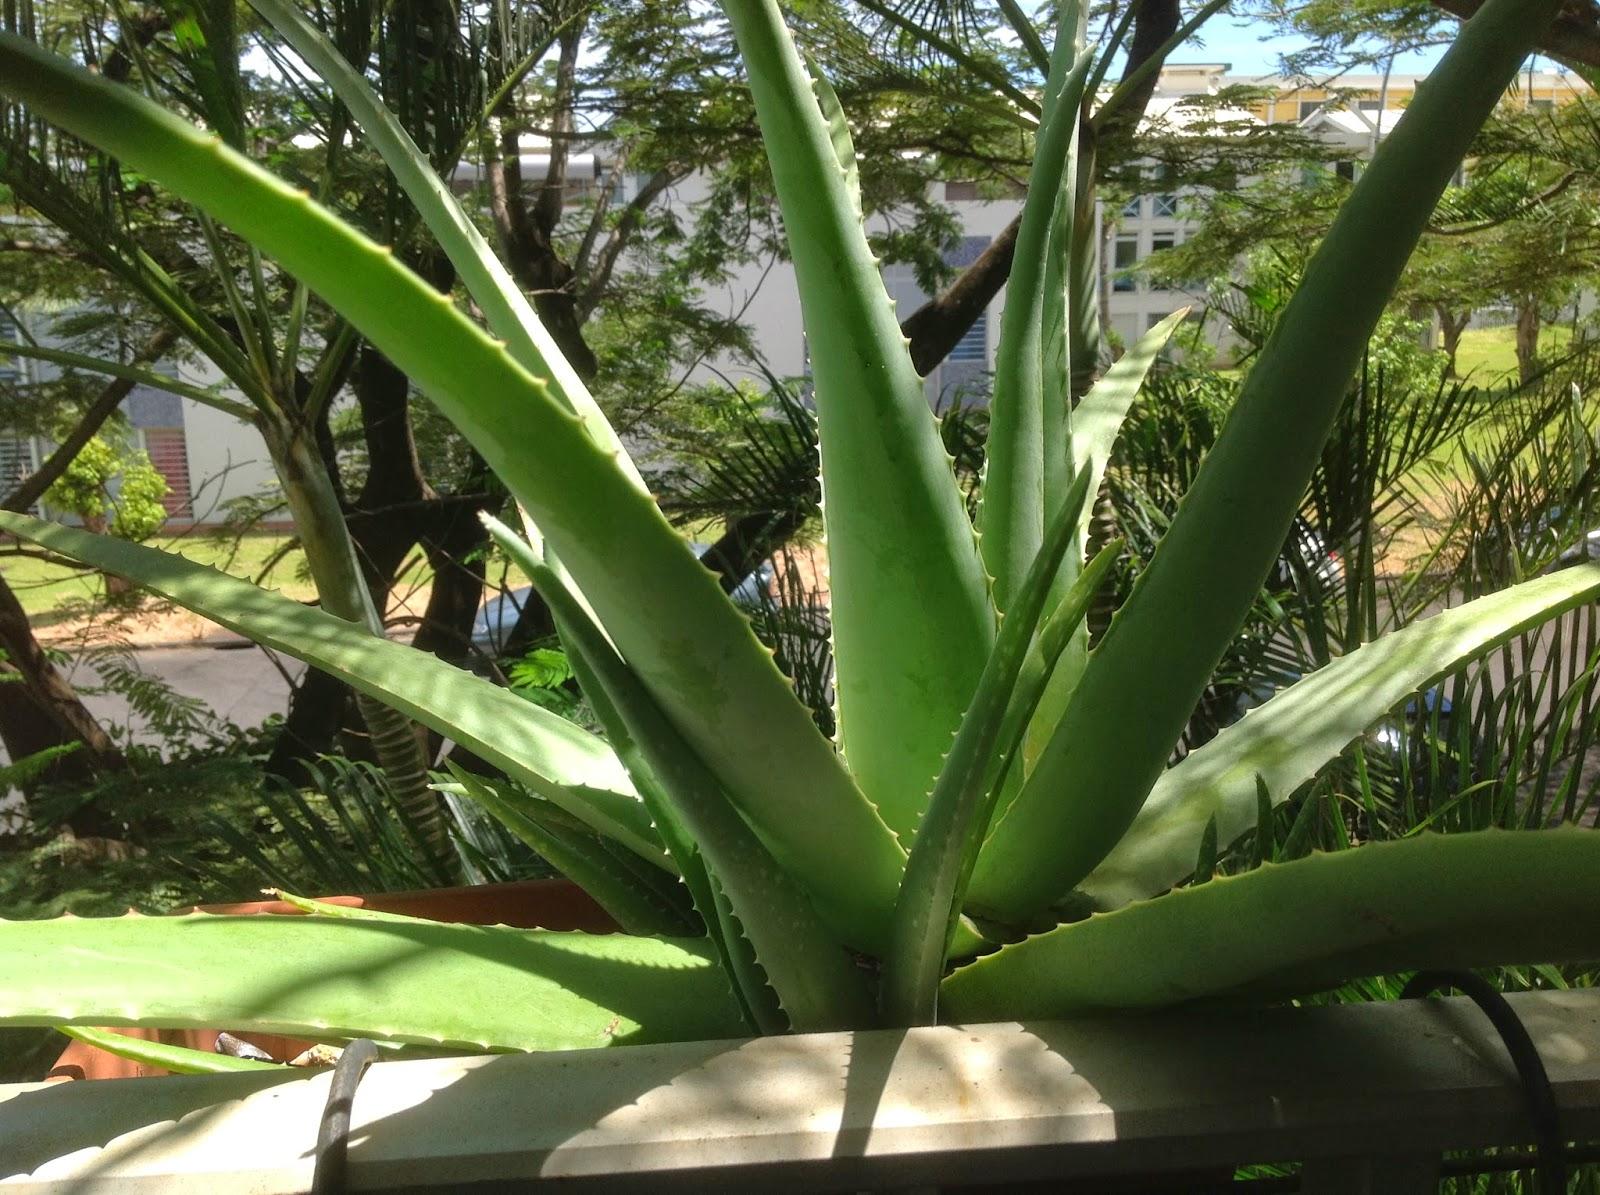 Aloe vera de la foret plante aloe vera - Plante aloe vera entretien arrosage ...